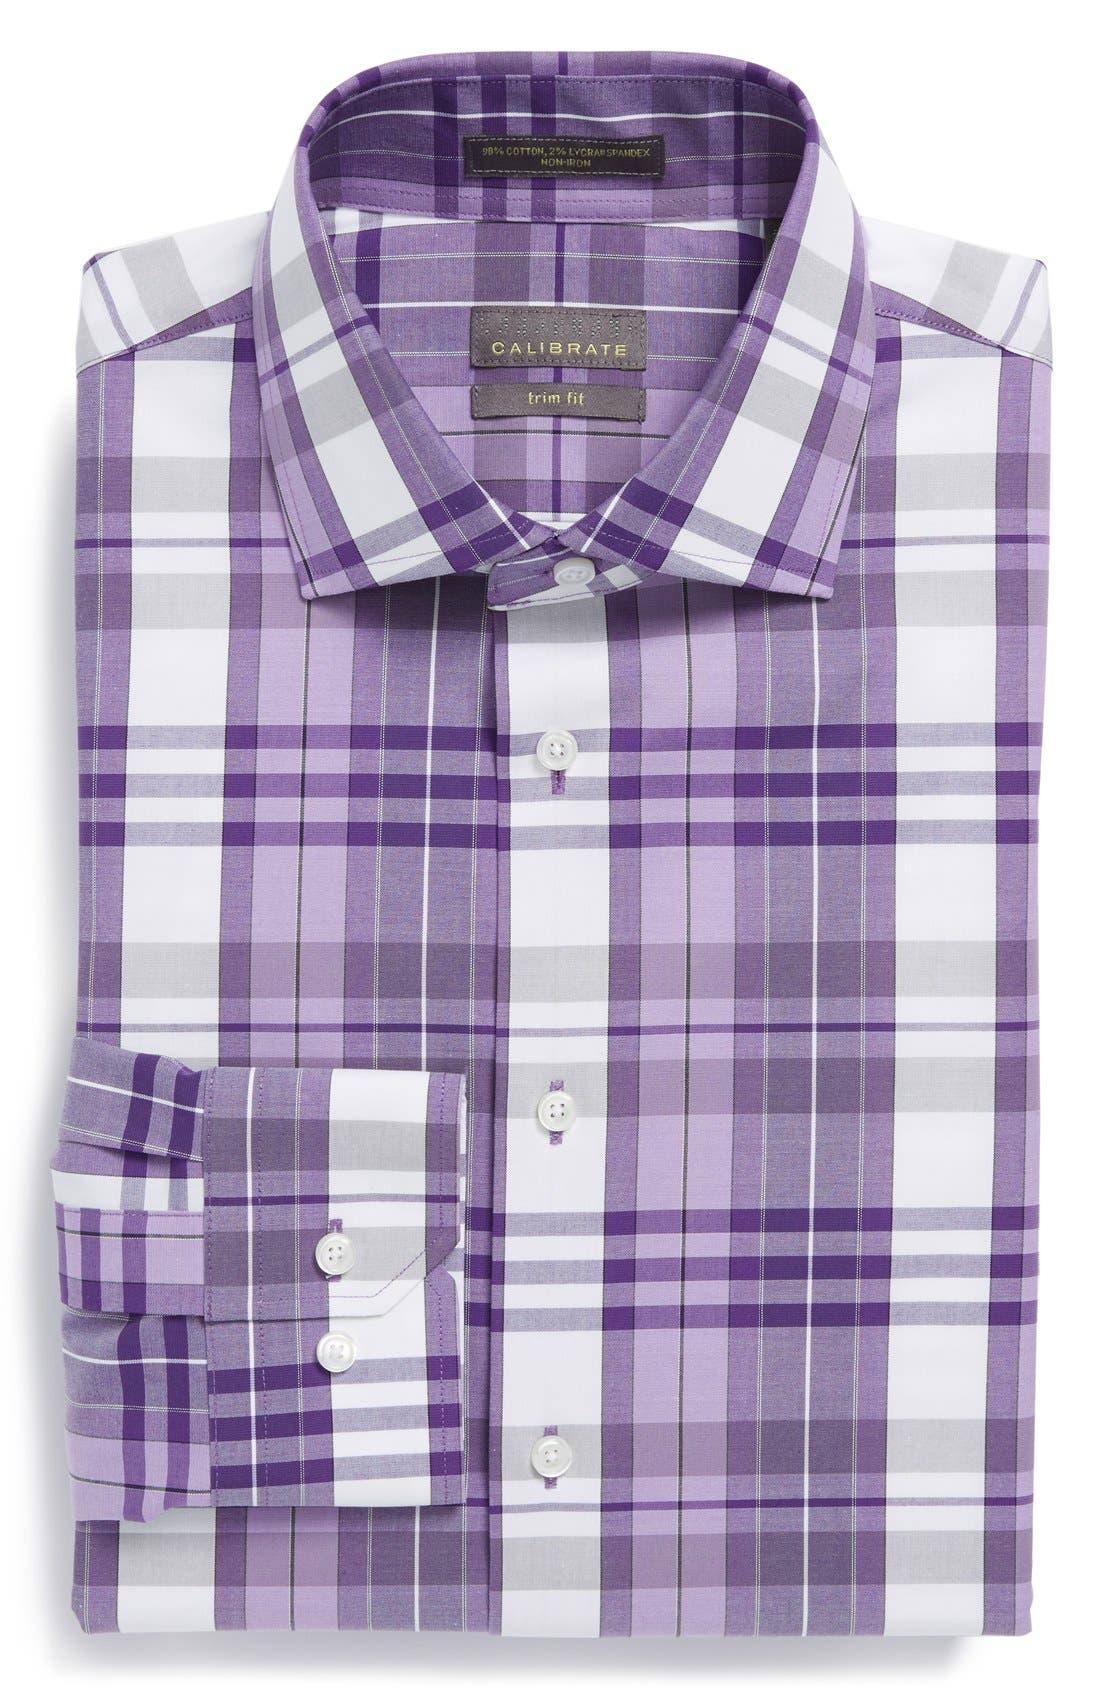 Alternate Image 1 Selected - Calibrate Trim Fit Non-Iron Stretch Plaid Dress Shirt